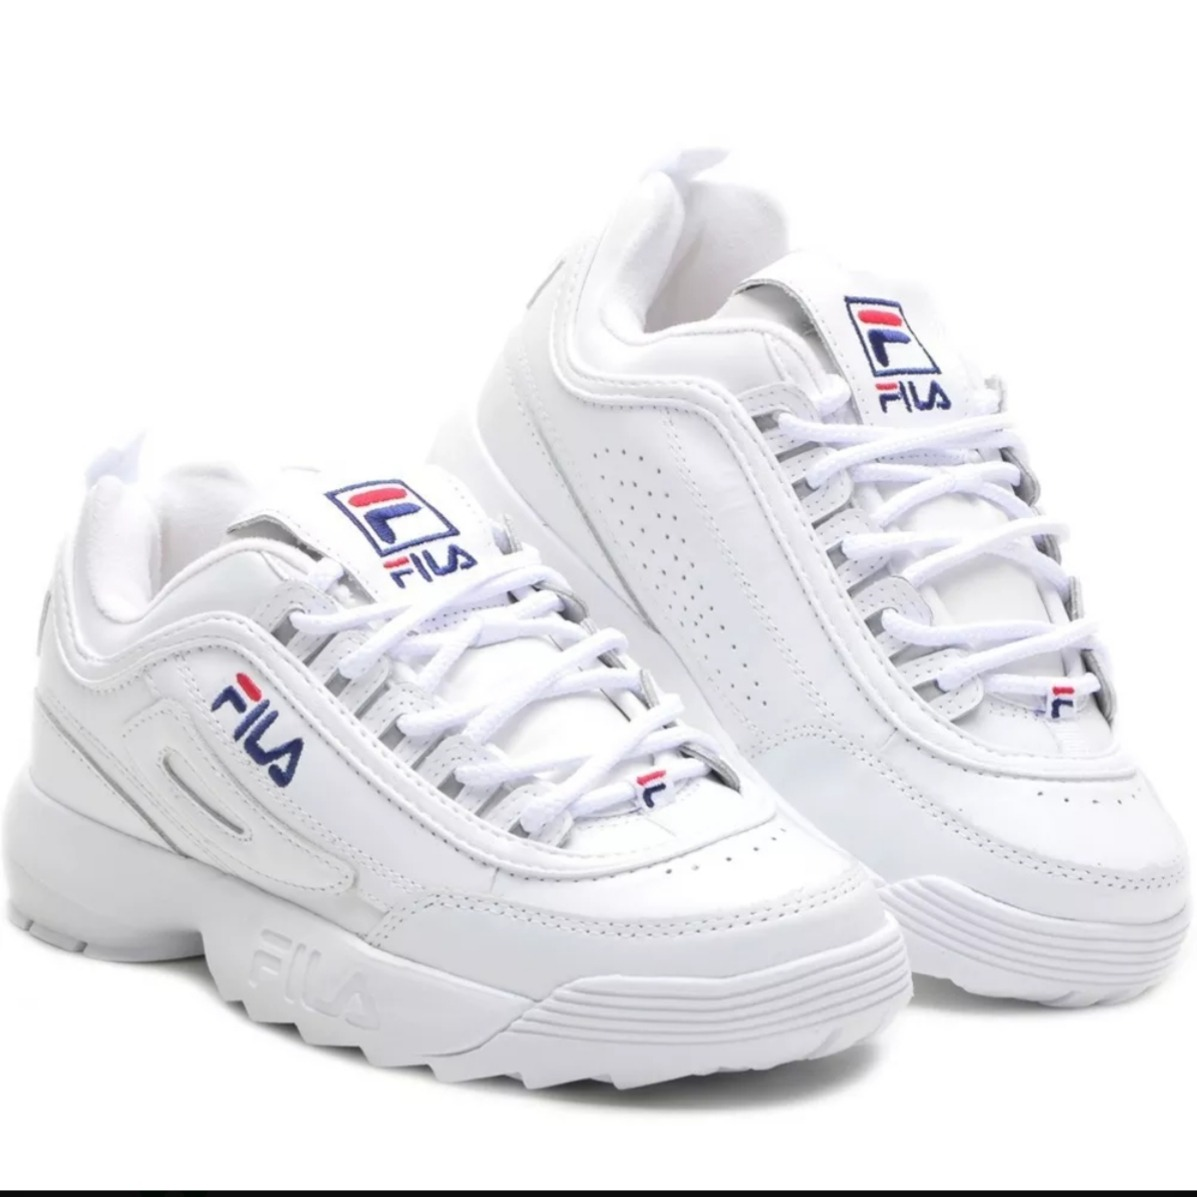 0930f3fdead tenis fila feminino disruptor sneaker lançamento promocional. Carregando  zoom.